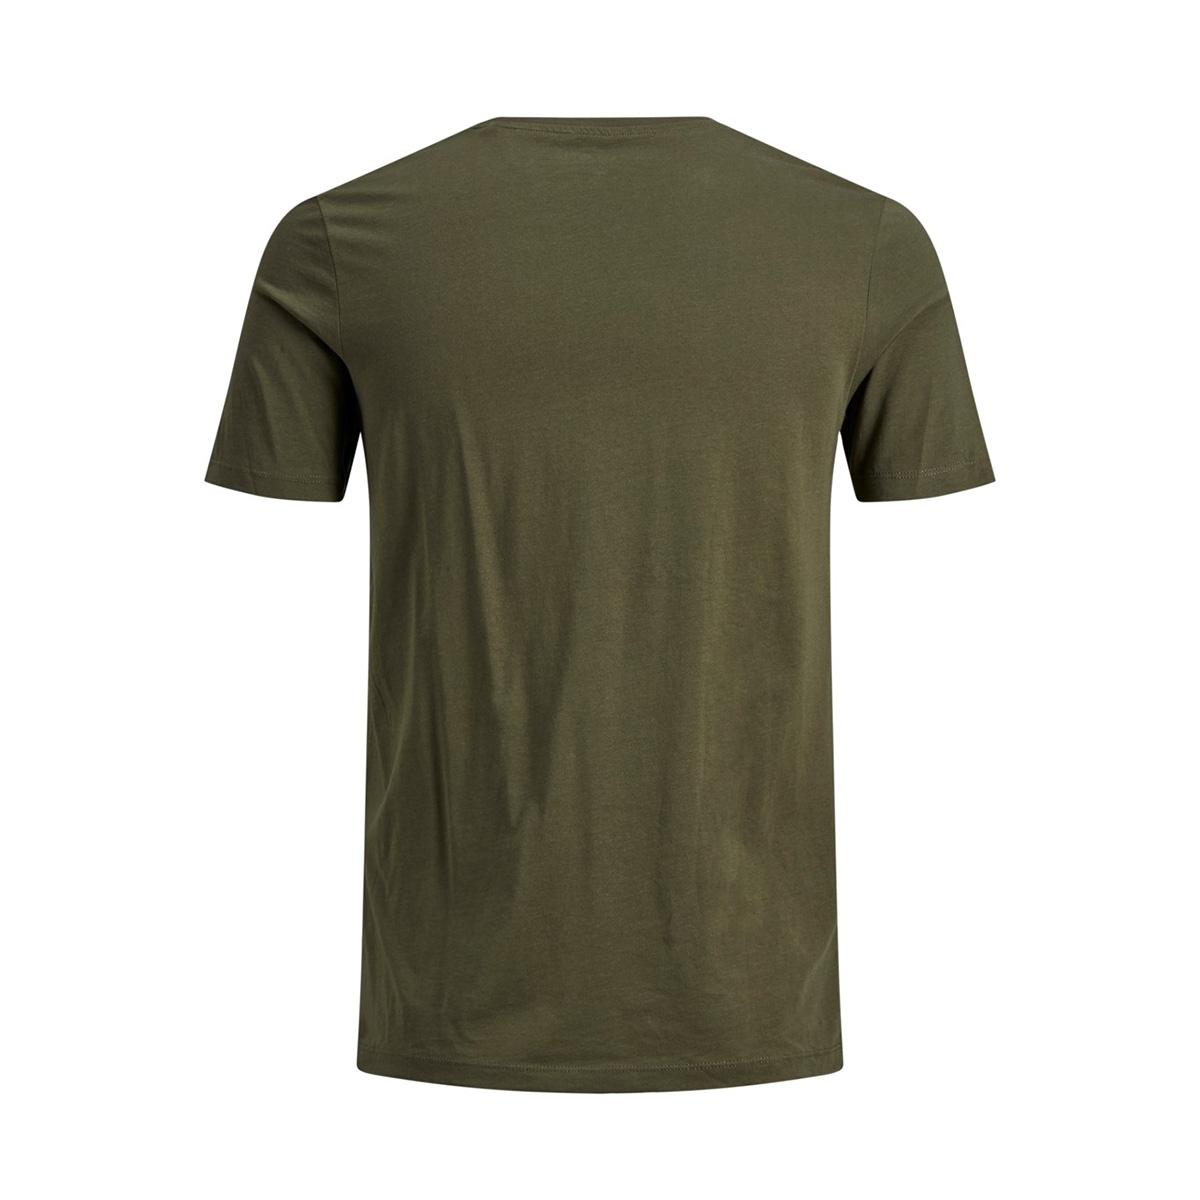 jjelogo tee ss crew neck 2 col aw19 12157325 jack & jones t-shirt olive night/slim